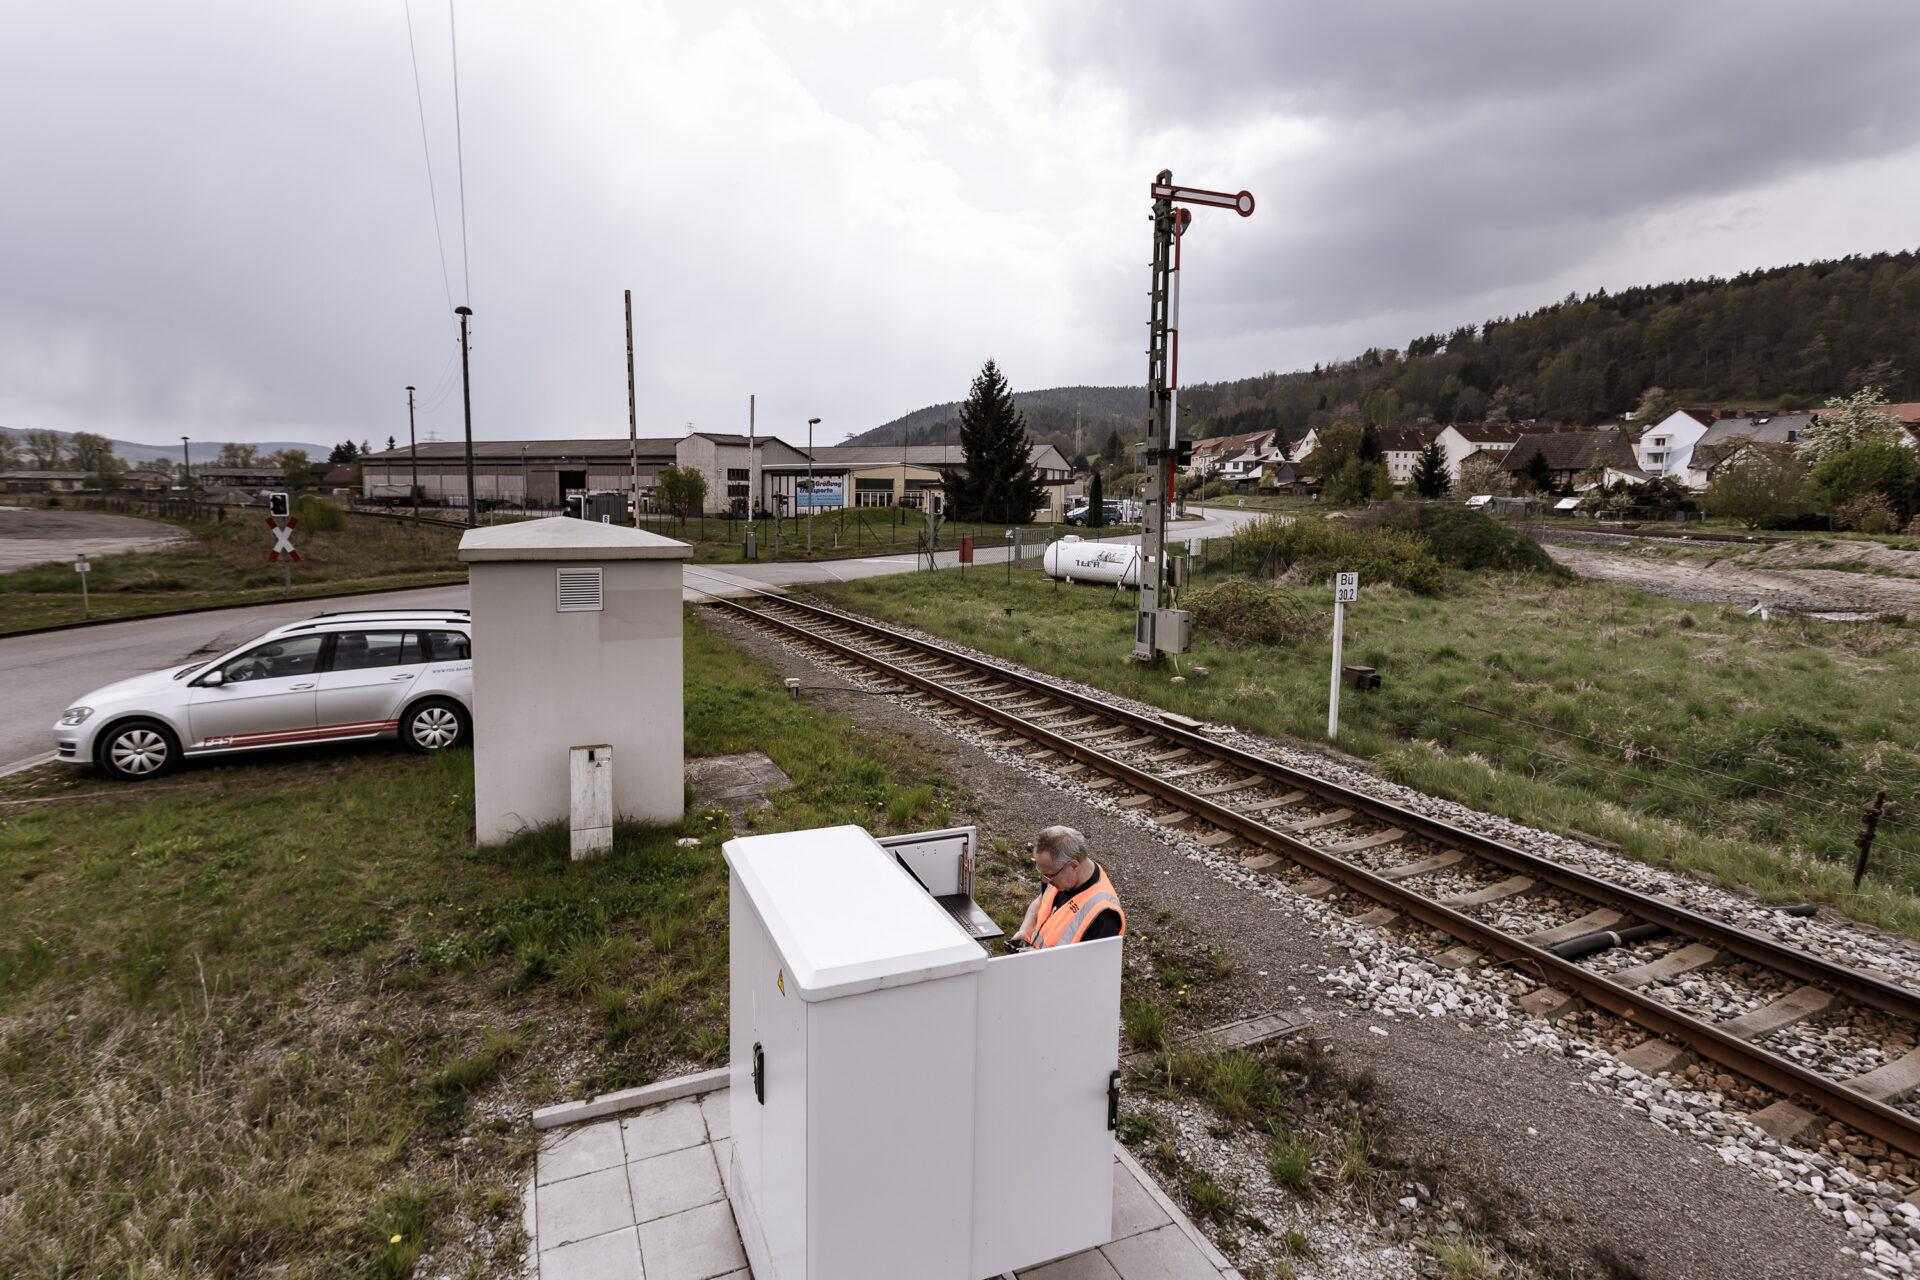 Arbeit, Bahntechnik, Bahnübergang, FES, FES Bahntechnik, Schranken Grimmenthal, Signal, image, stellwerk